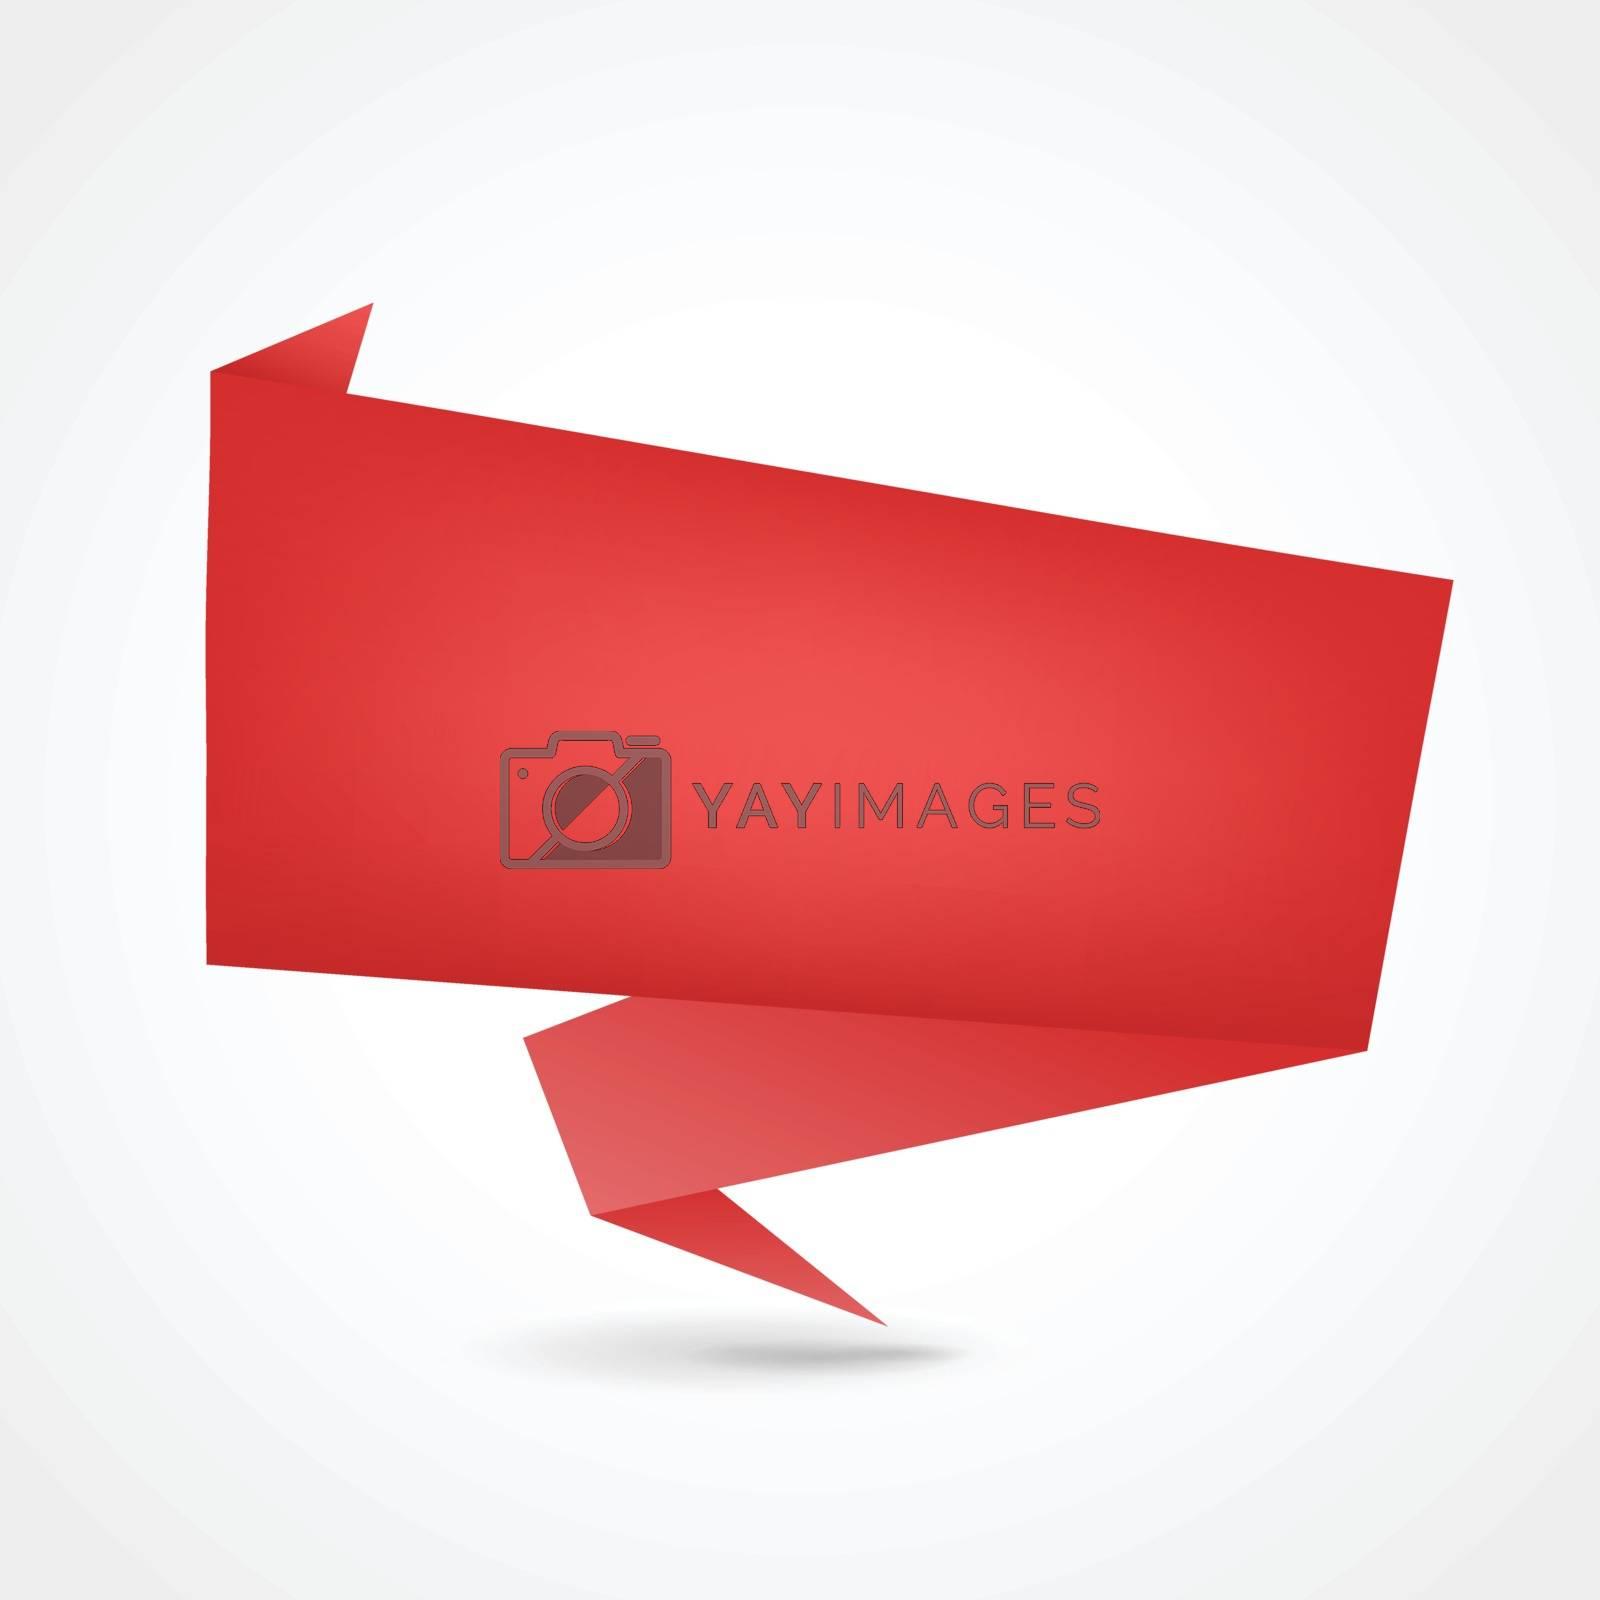 illustration of red origami design concept background